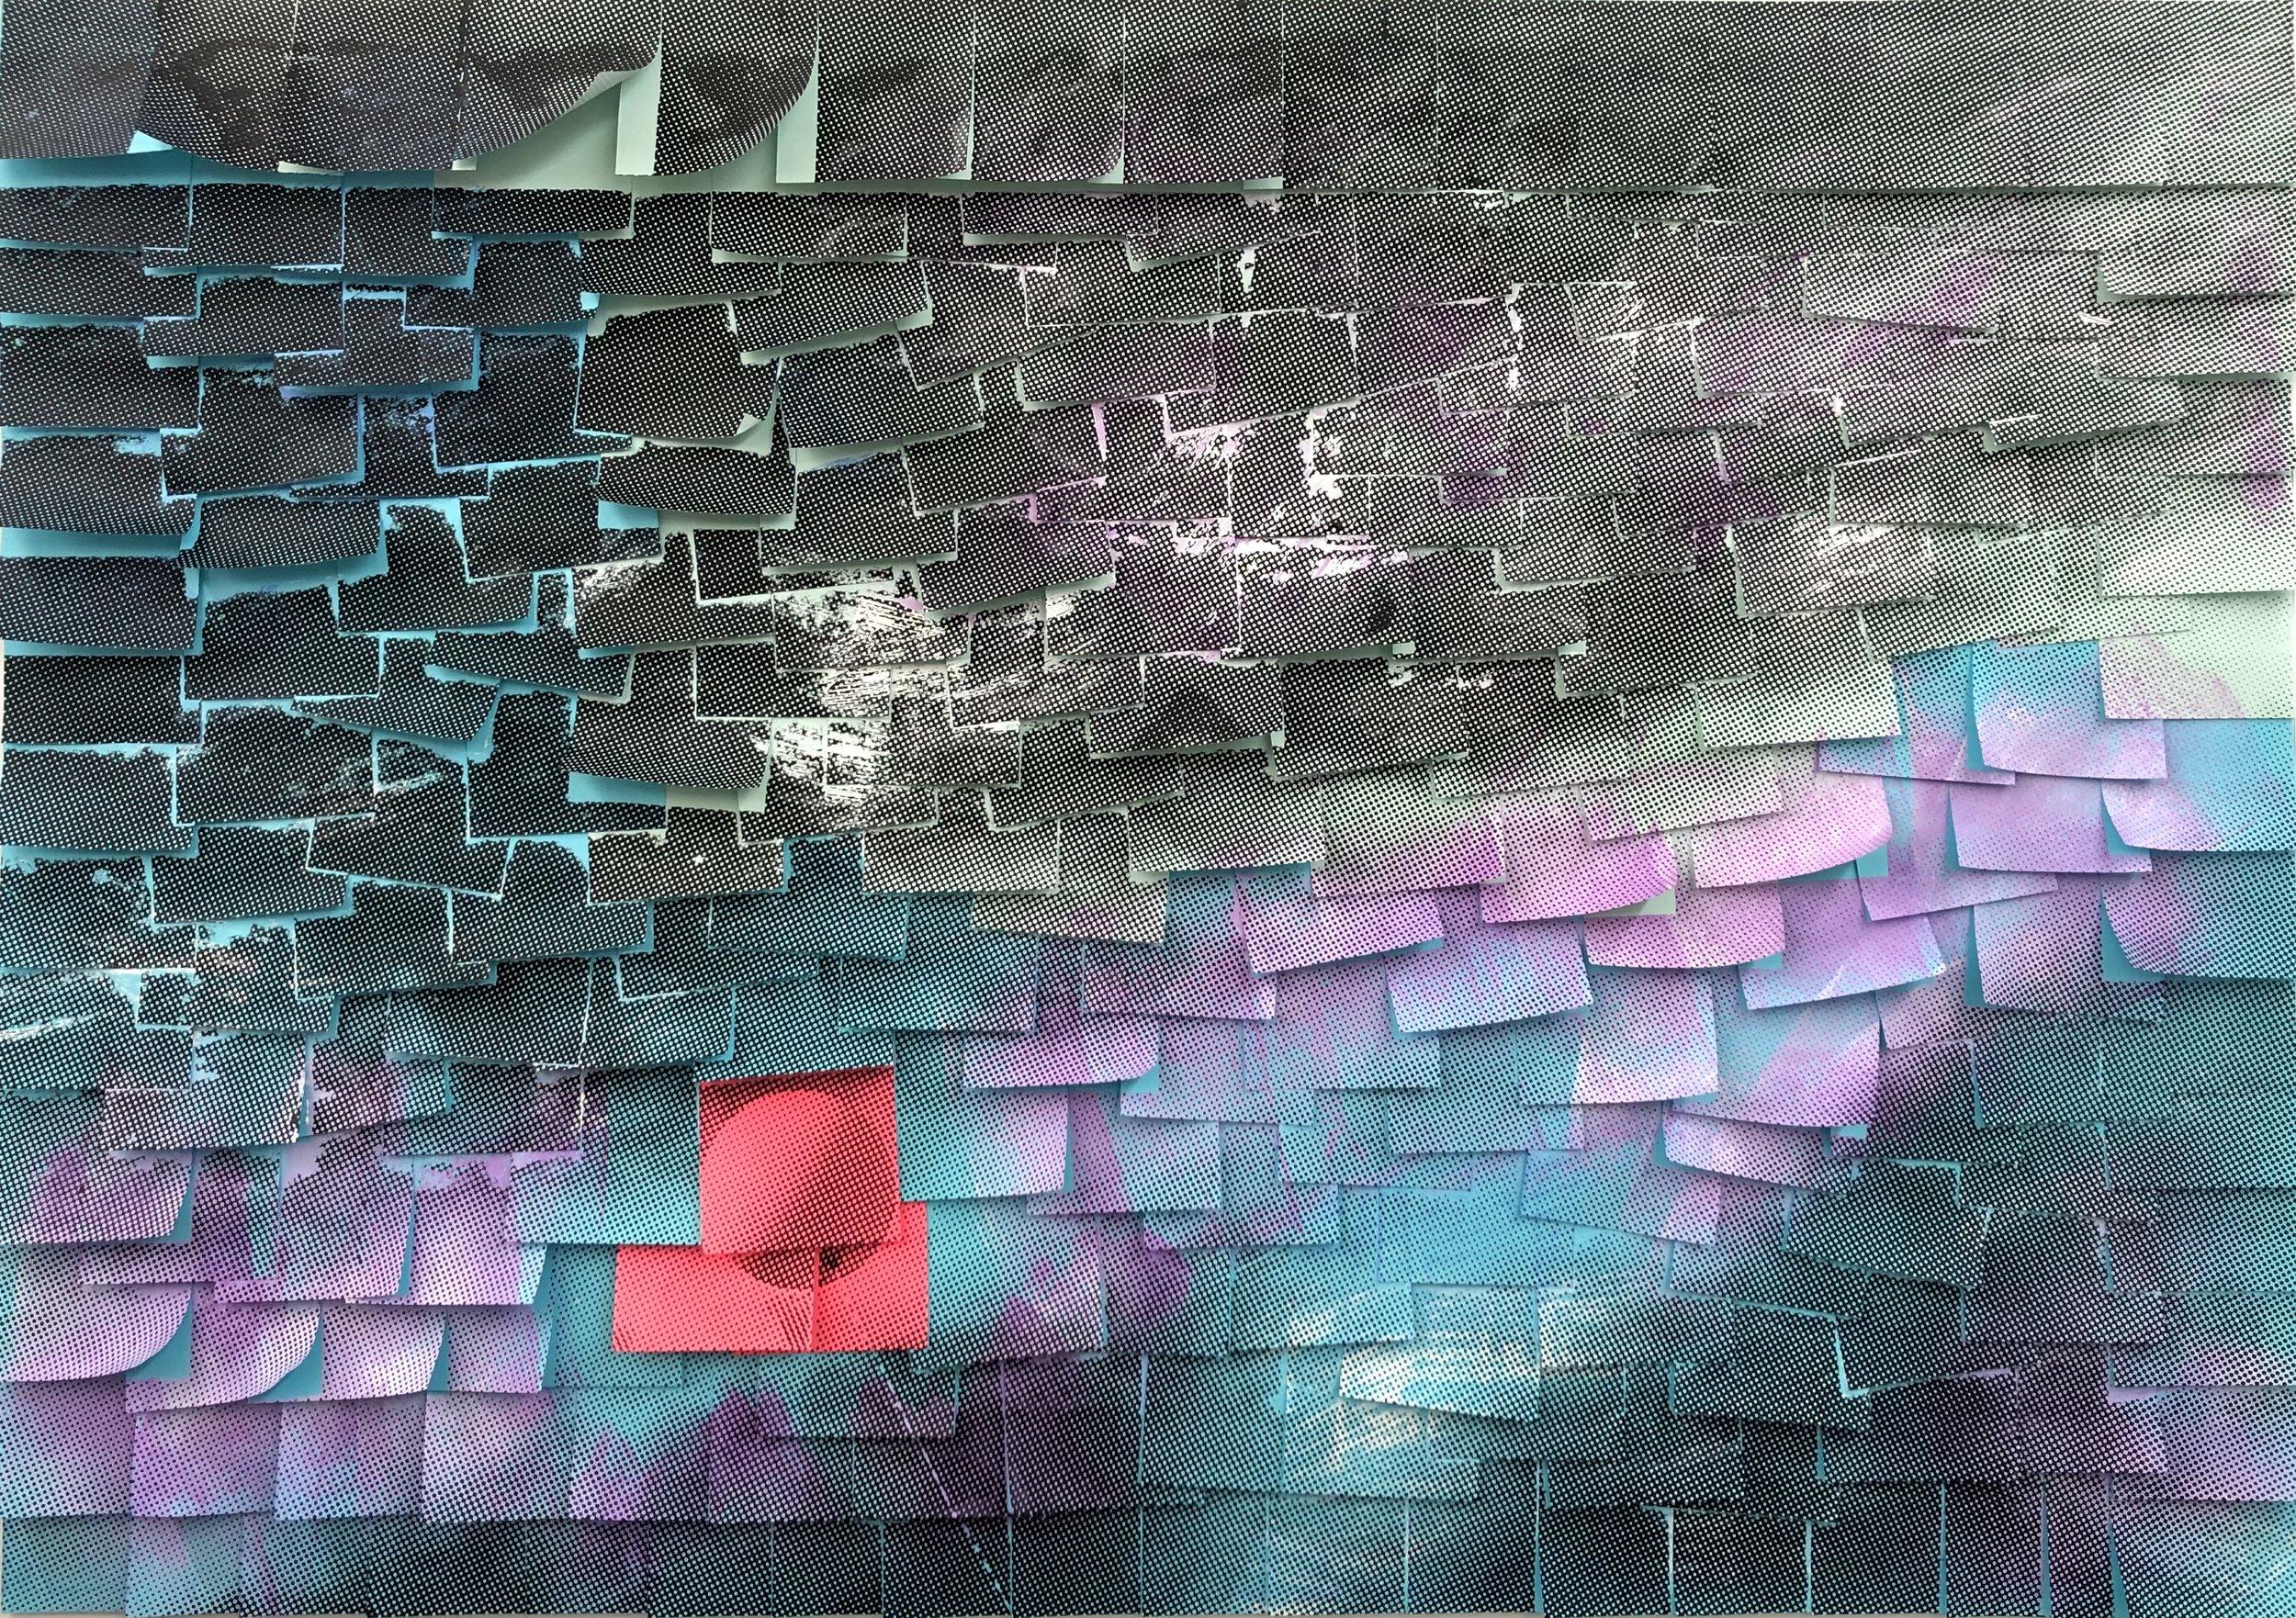 Anna Laudel Gallery, Ardan Özmenoglu, Joy, 2019, Painting and screen printing on post-it notes, 25 x 35.5in.jpg